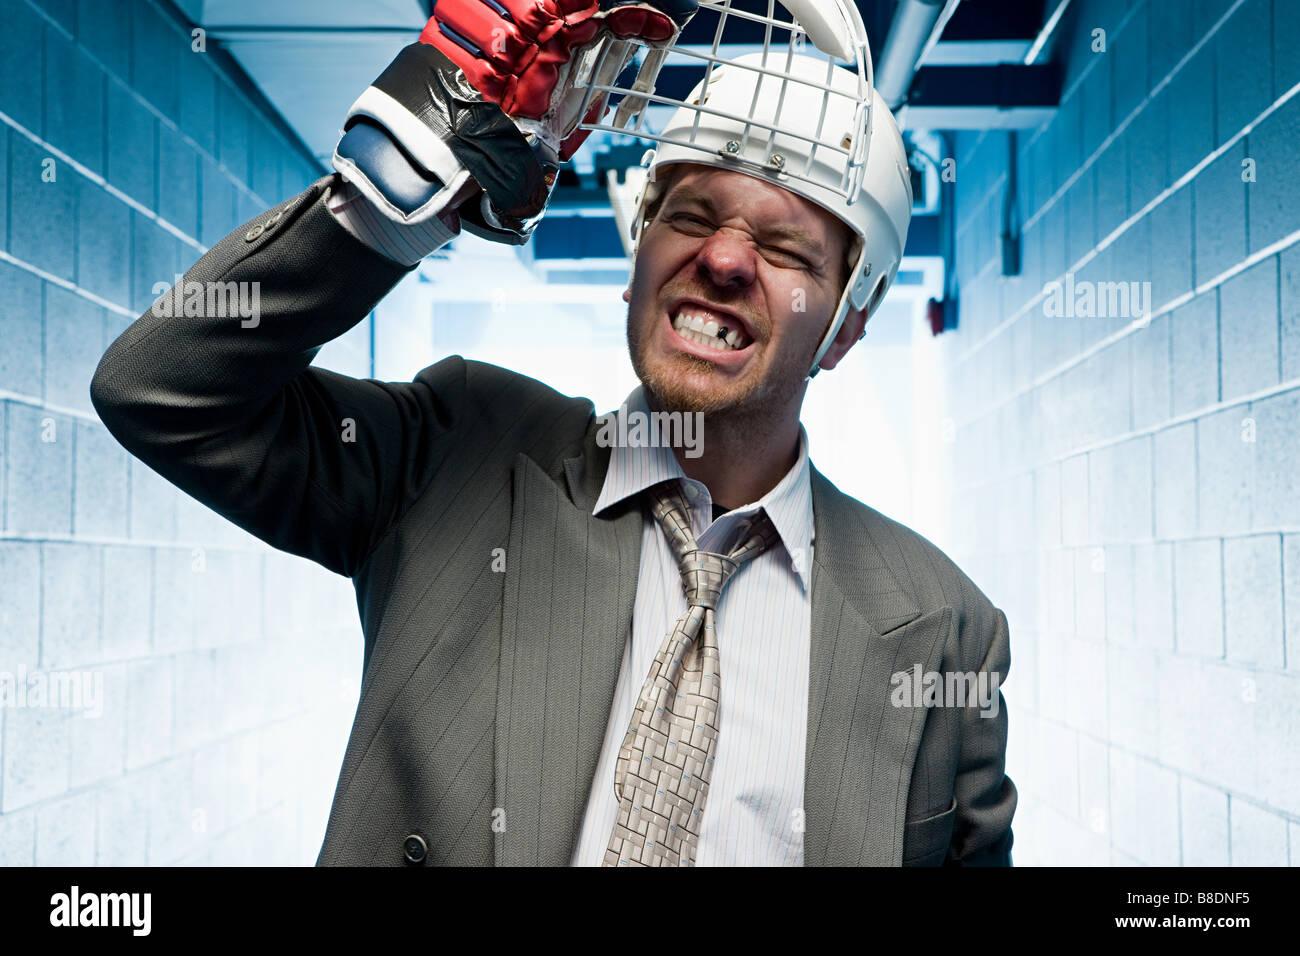 Grimacing businessman in a sports helmet - Stock Image